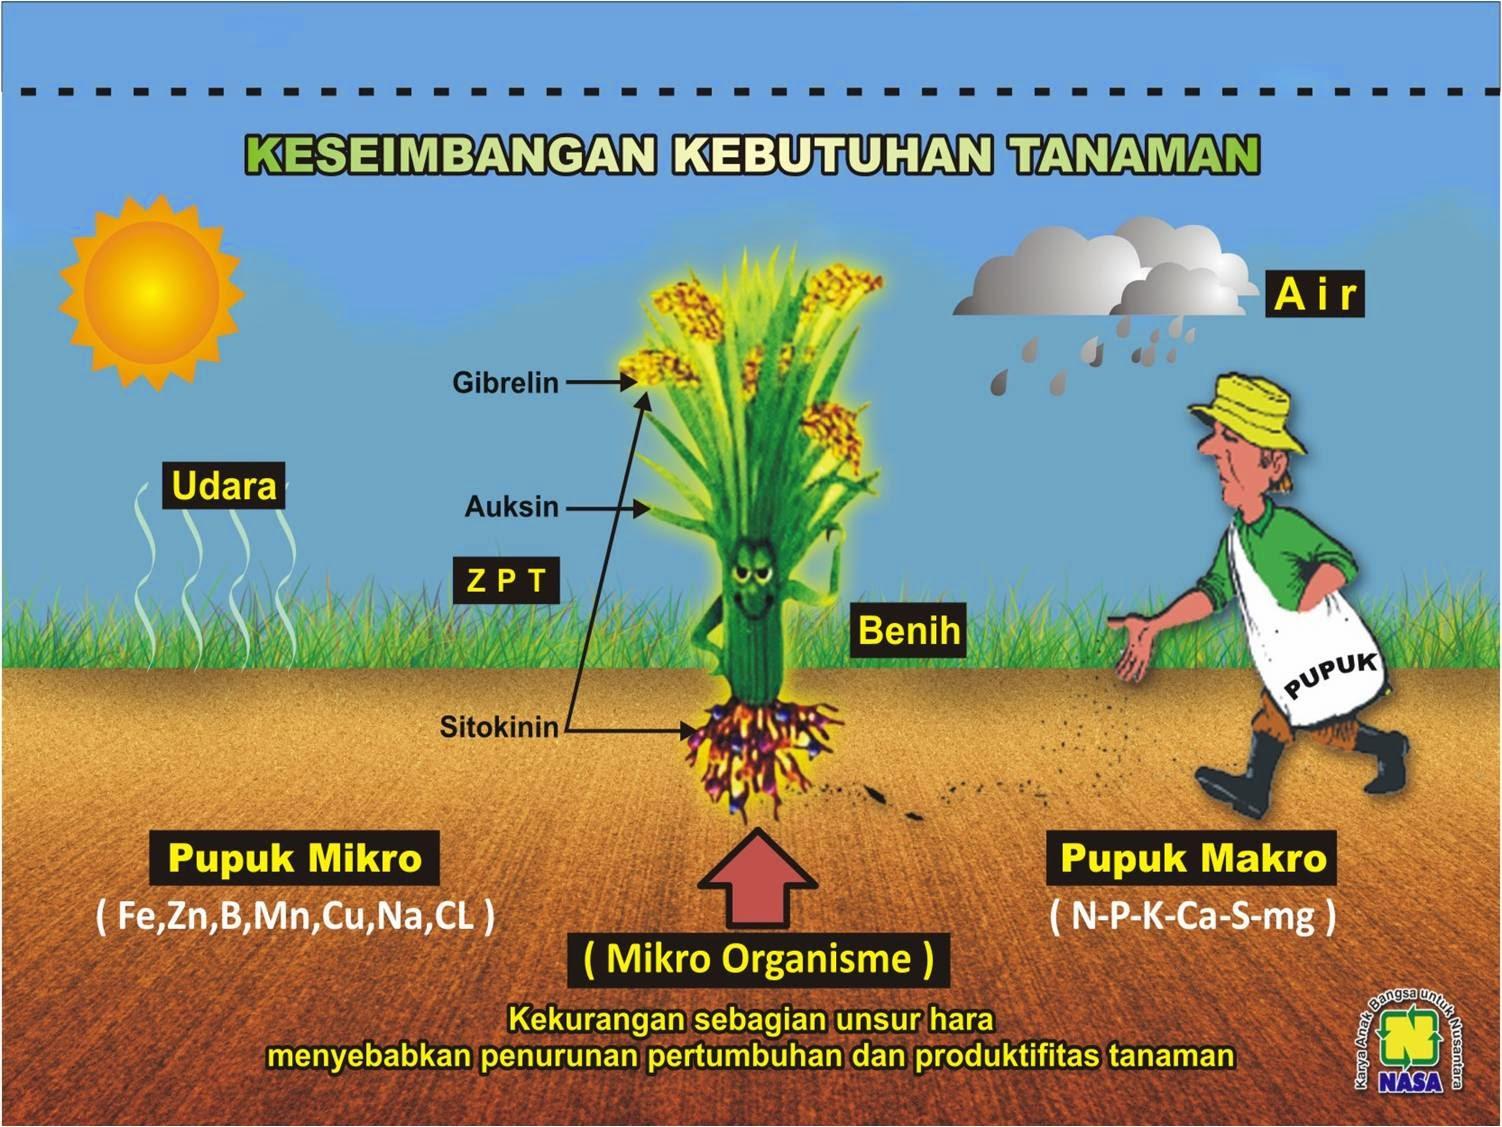 kebutuhan-unsur-hara-tanaman-produk-nasa-supernasa-poc-nasa-hormonik-power-nutrition-distributor-resmi-stokist-online